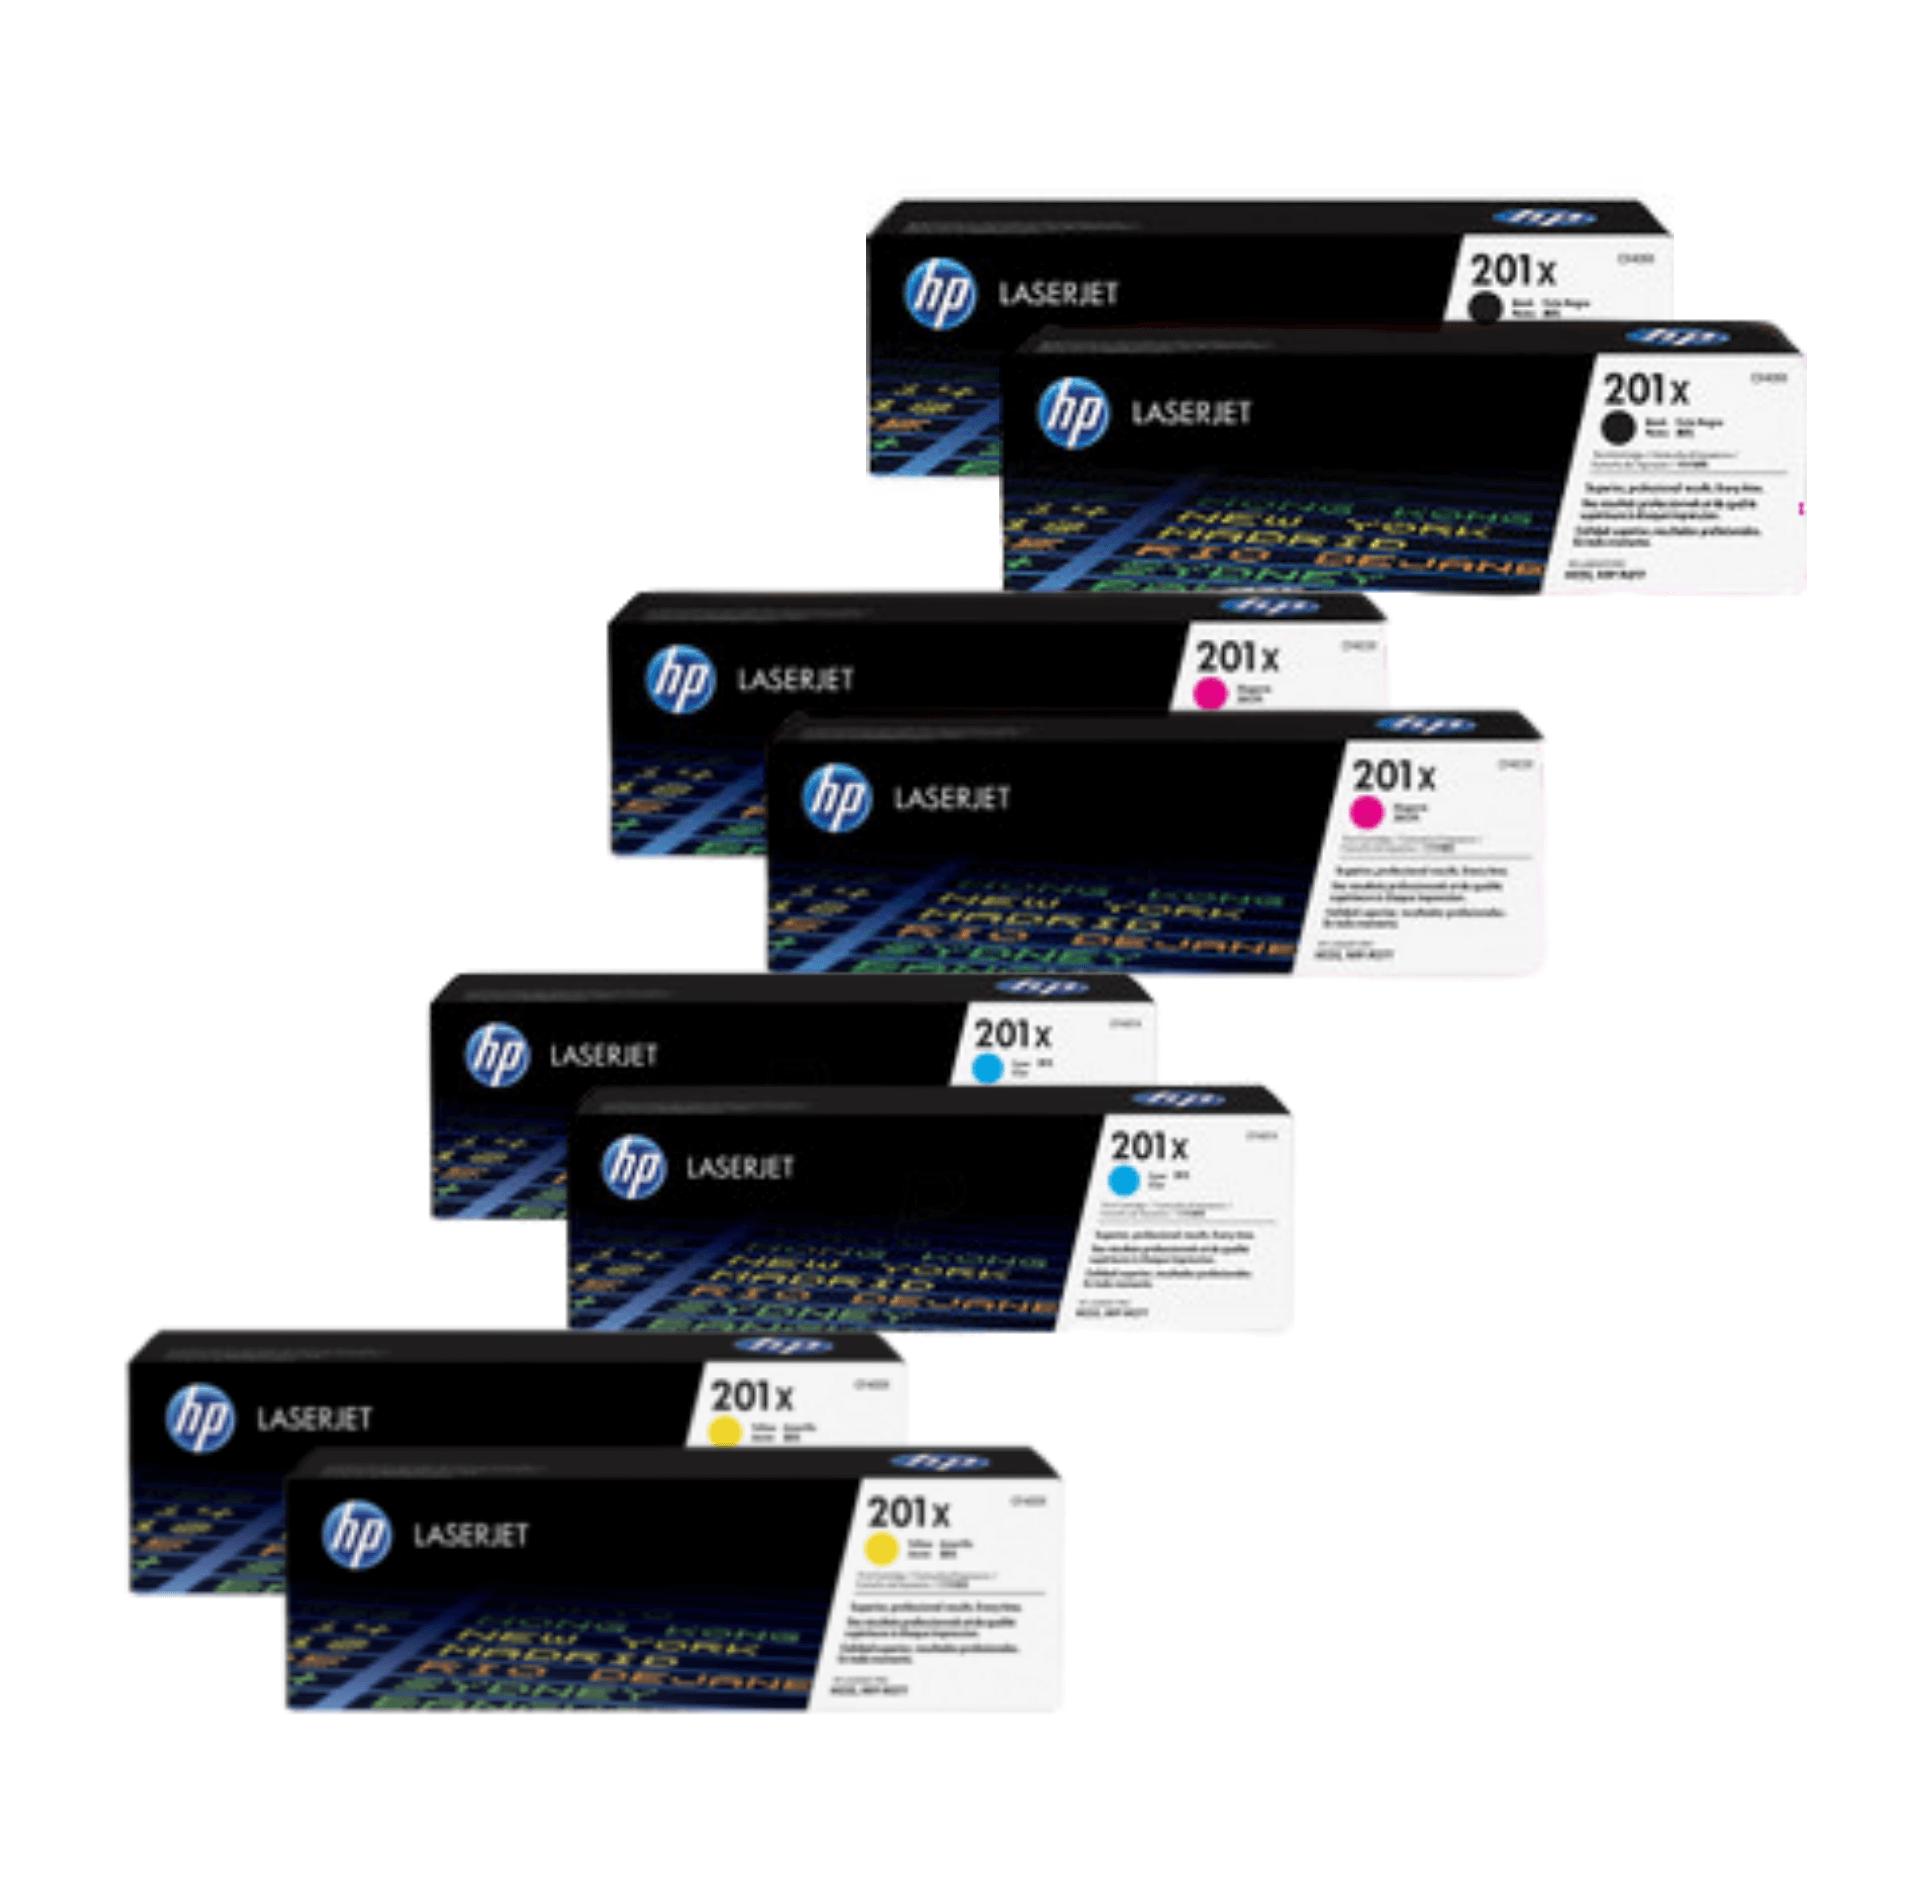 HP 201X Toner Cartridges Value Pack - Includes: [2 x Black, Cyan, Magenta, Yellow]